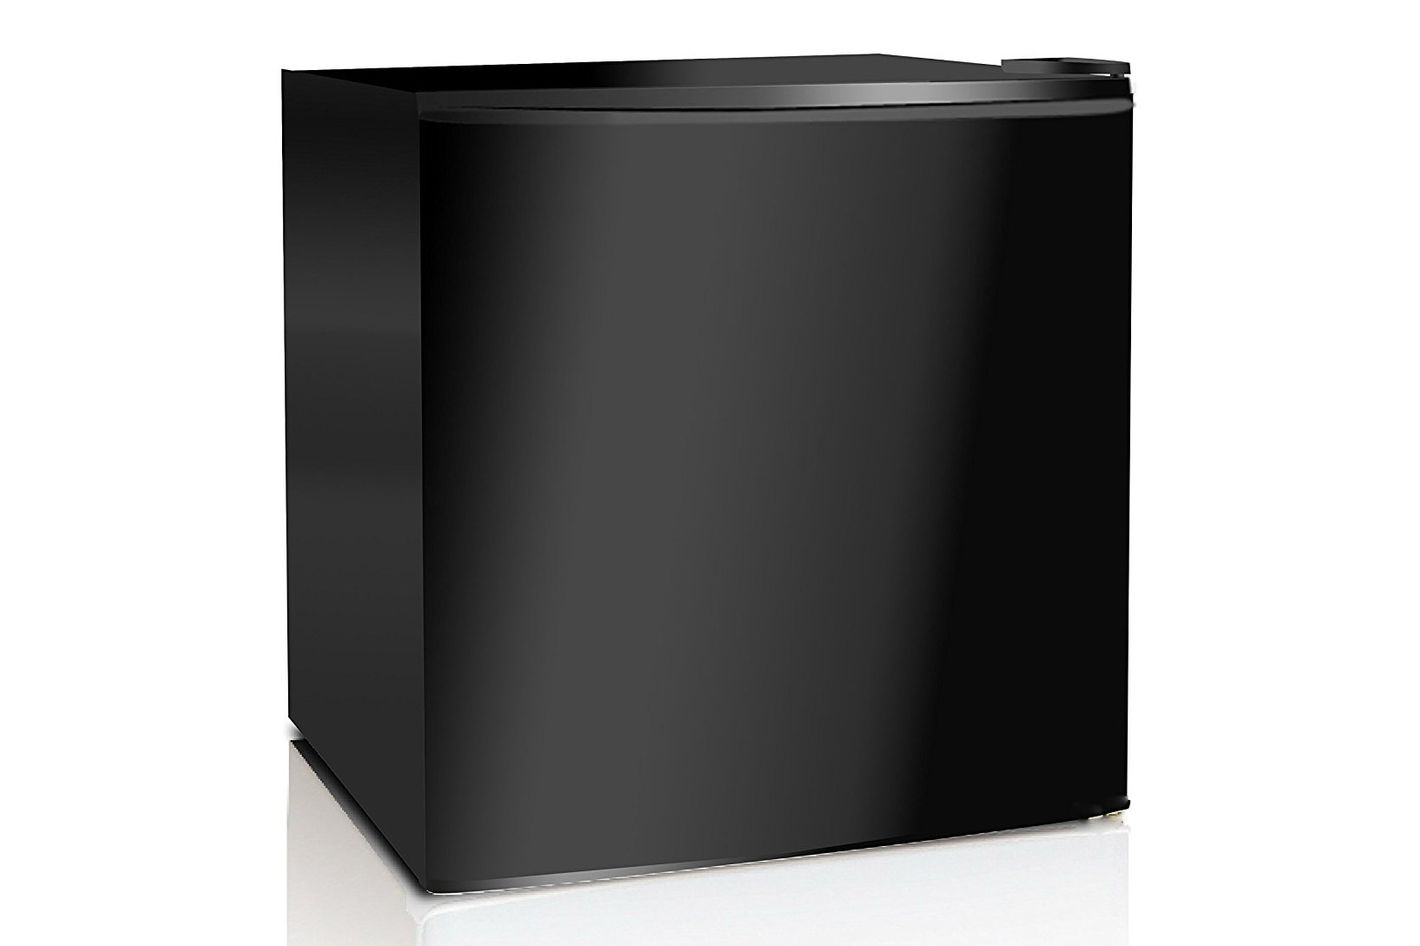 Midea Compact Single Reversible Door Refrigerator